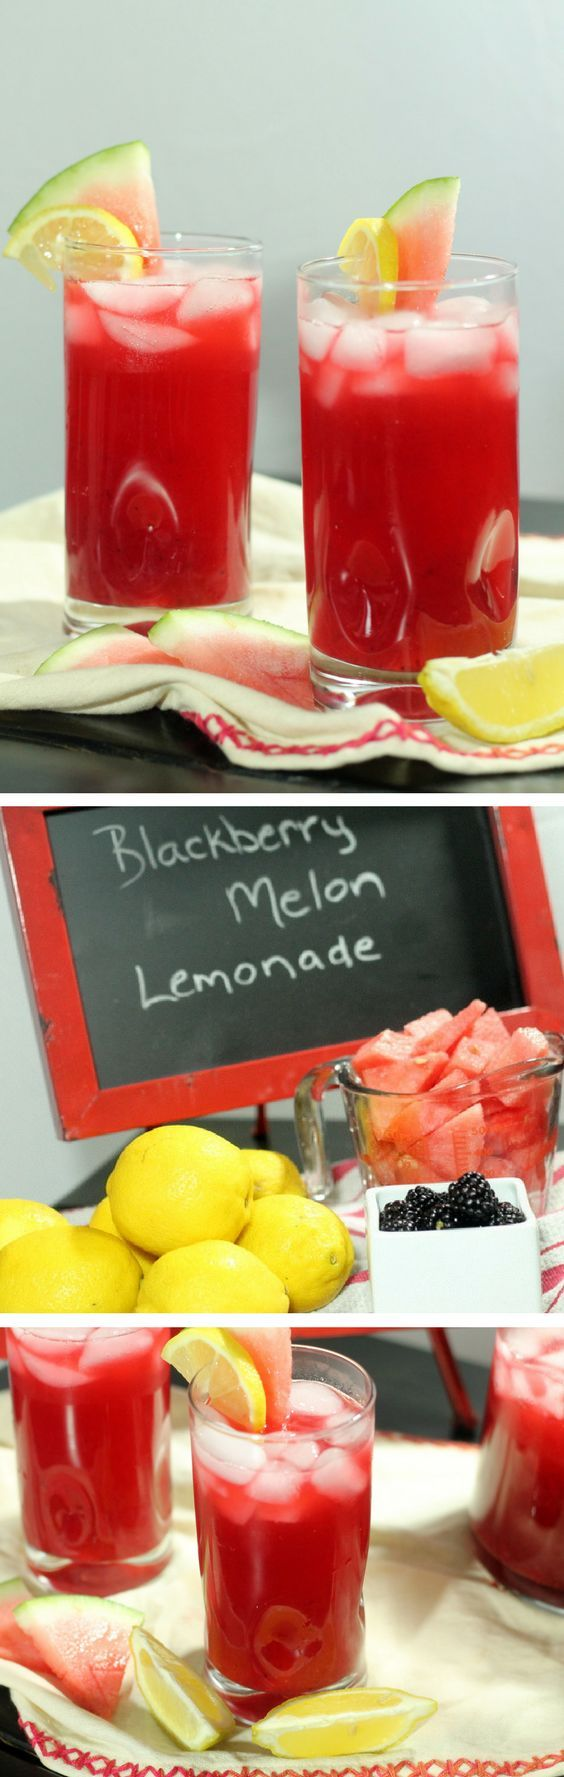 Easy Homemade Lemonade Recipe: all natural blackberry melon lemonade recipe via @heatherlm4